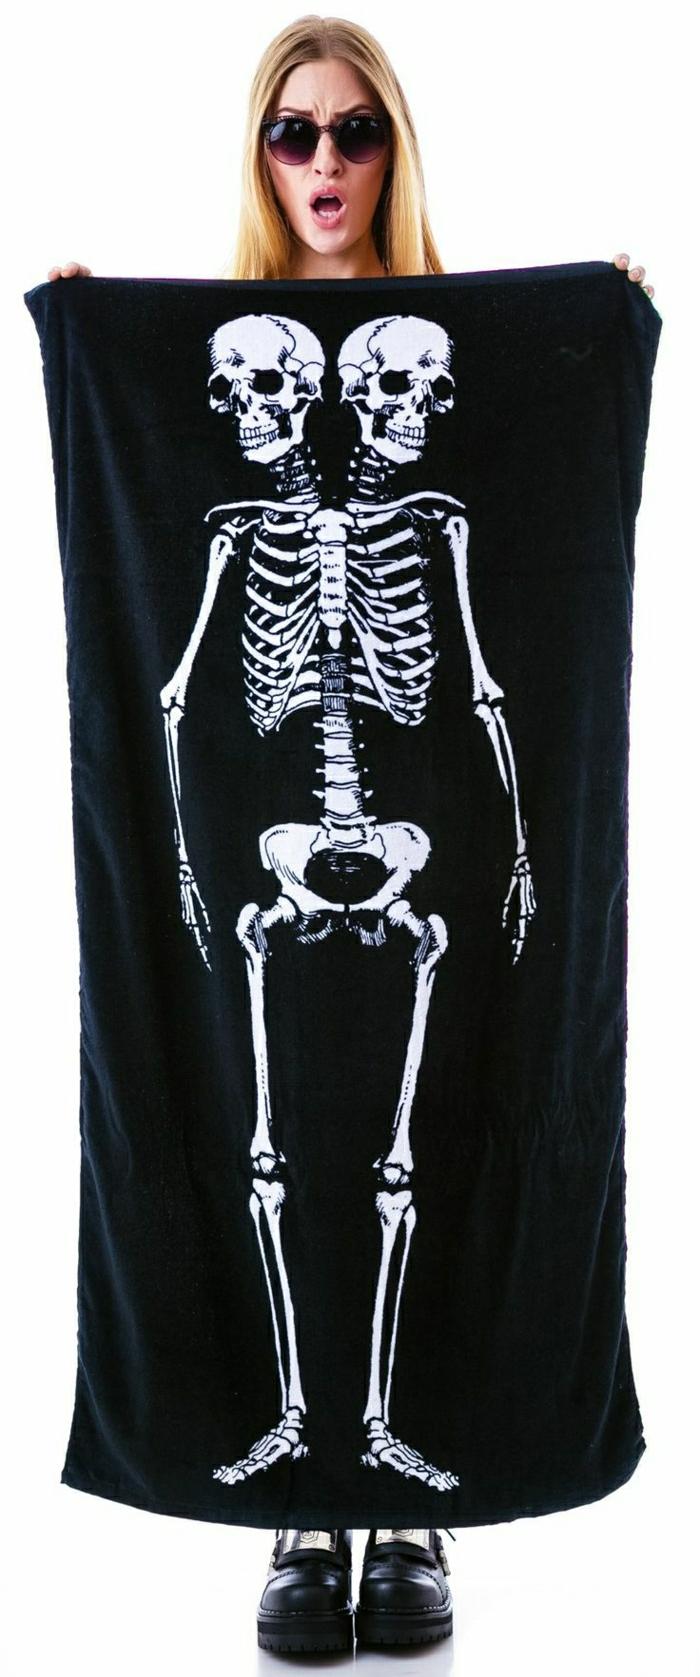 schwarzes-Tuch-Baden-Strand-Skelett-Muster